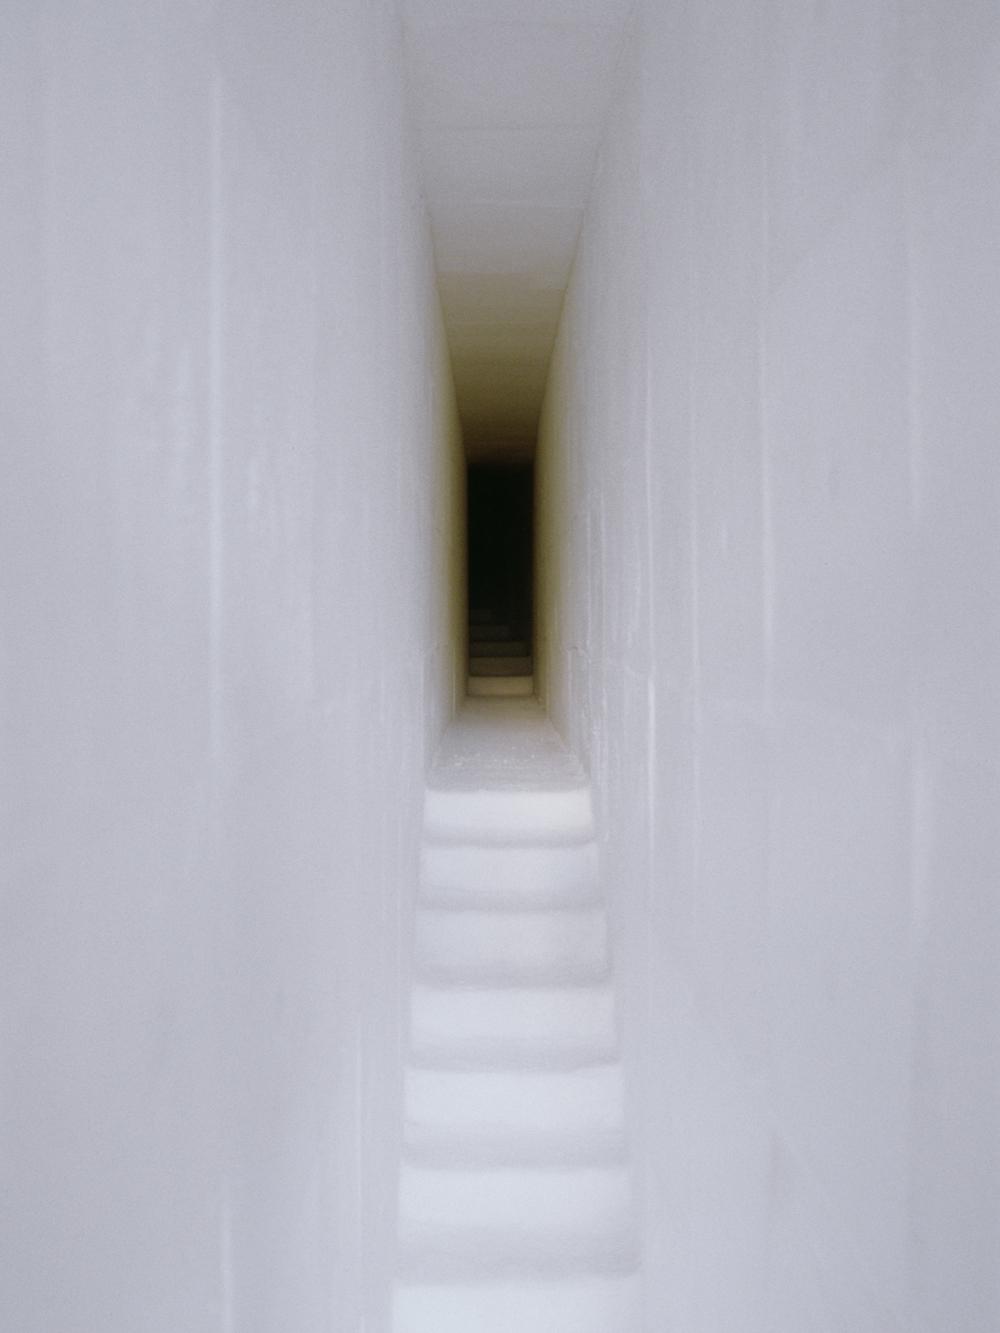 A Corridor to Remembrance, 1998